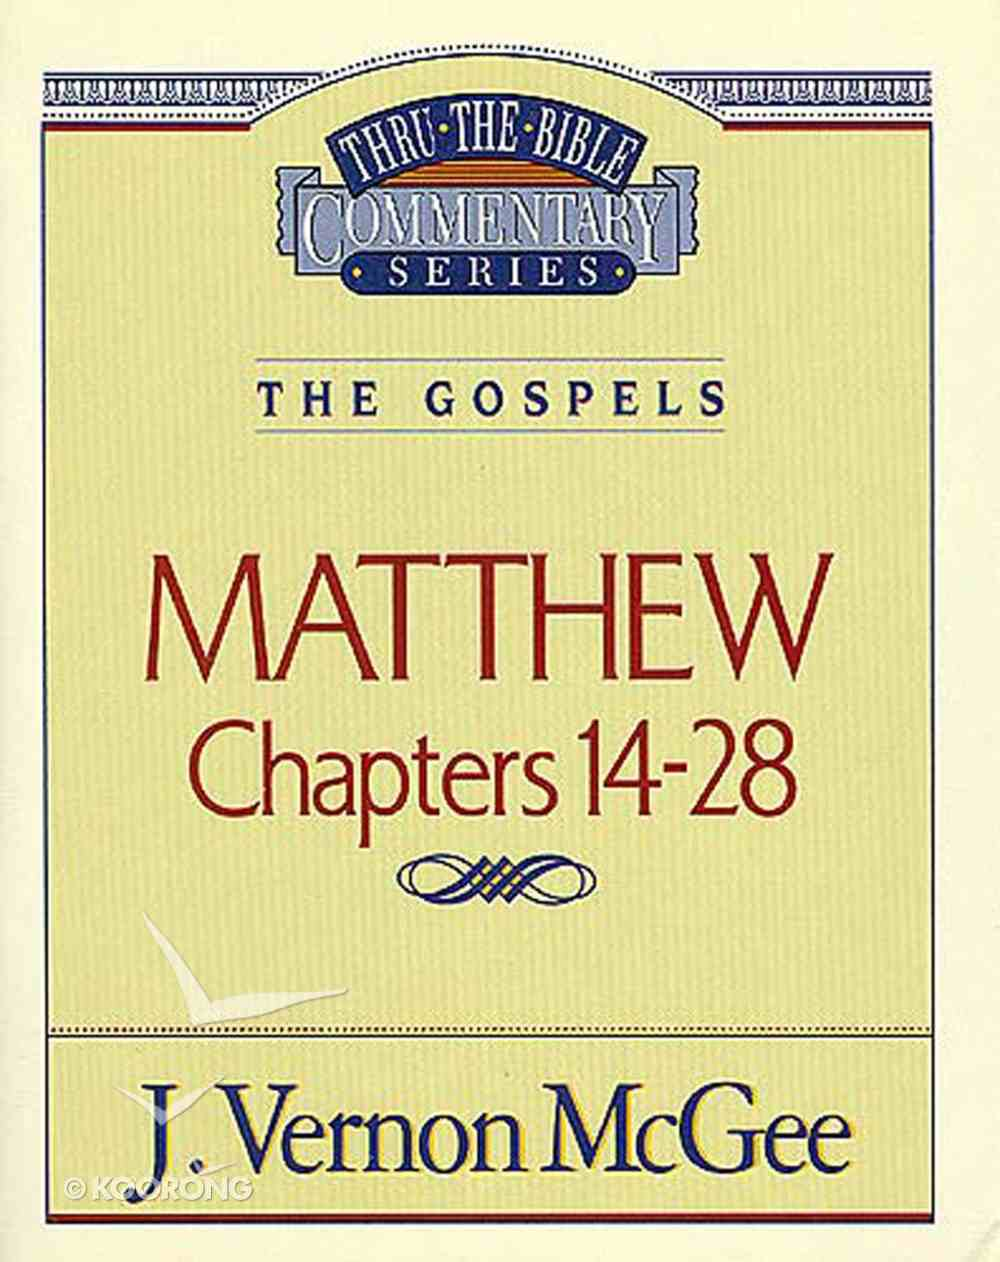 Thru the Bible NT #35: Matthew (Volume 2) (#35 in Thru The Bible New Testament Series) eBook